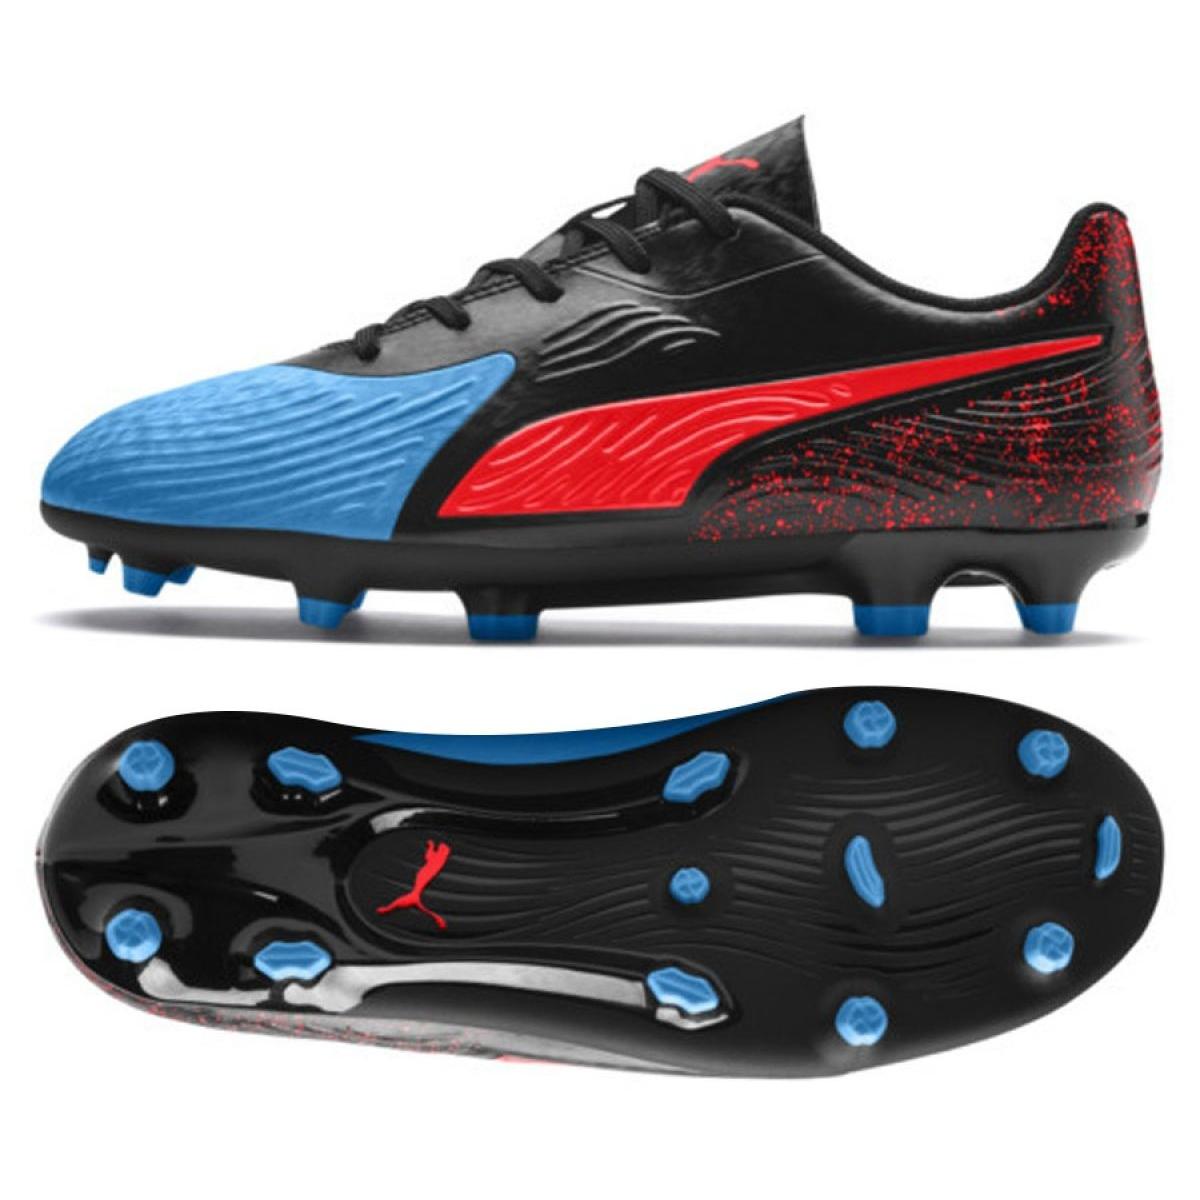 Dettagli su Puma One 19.4 Fg Ag Jr 105501 01 chaussures de football multicolore noir